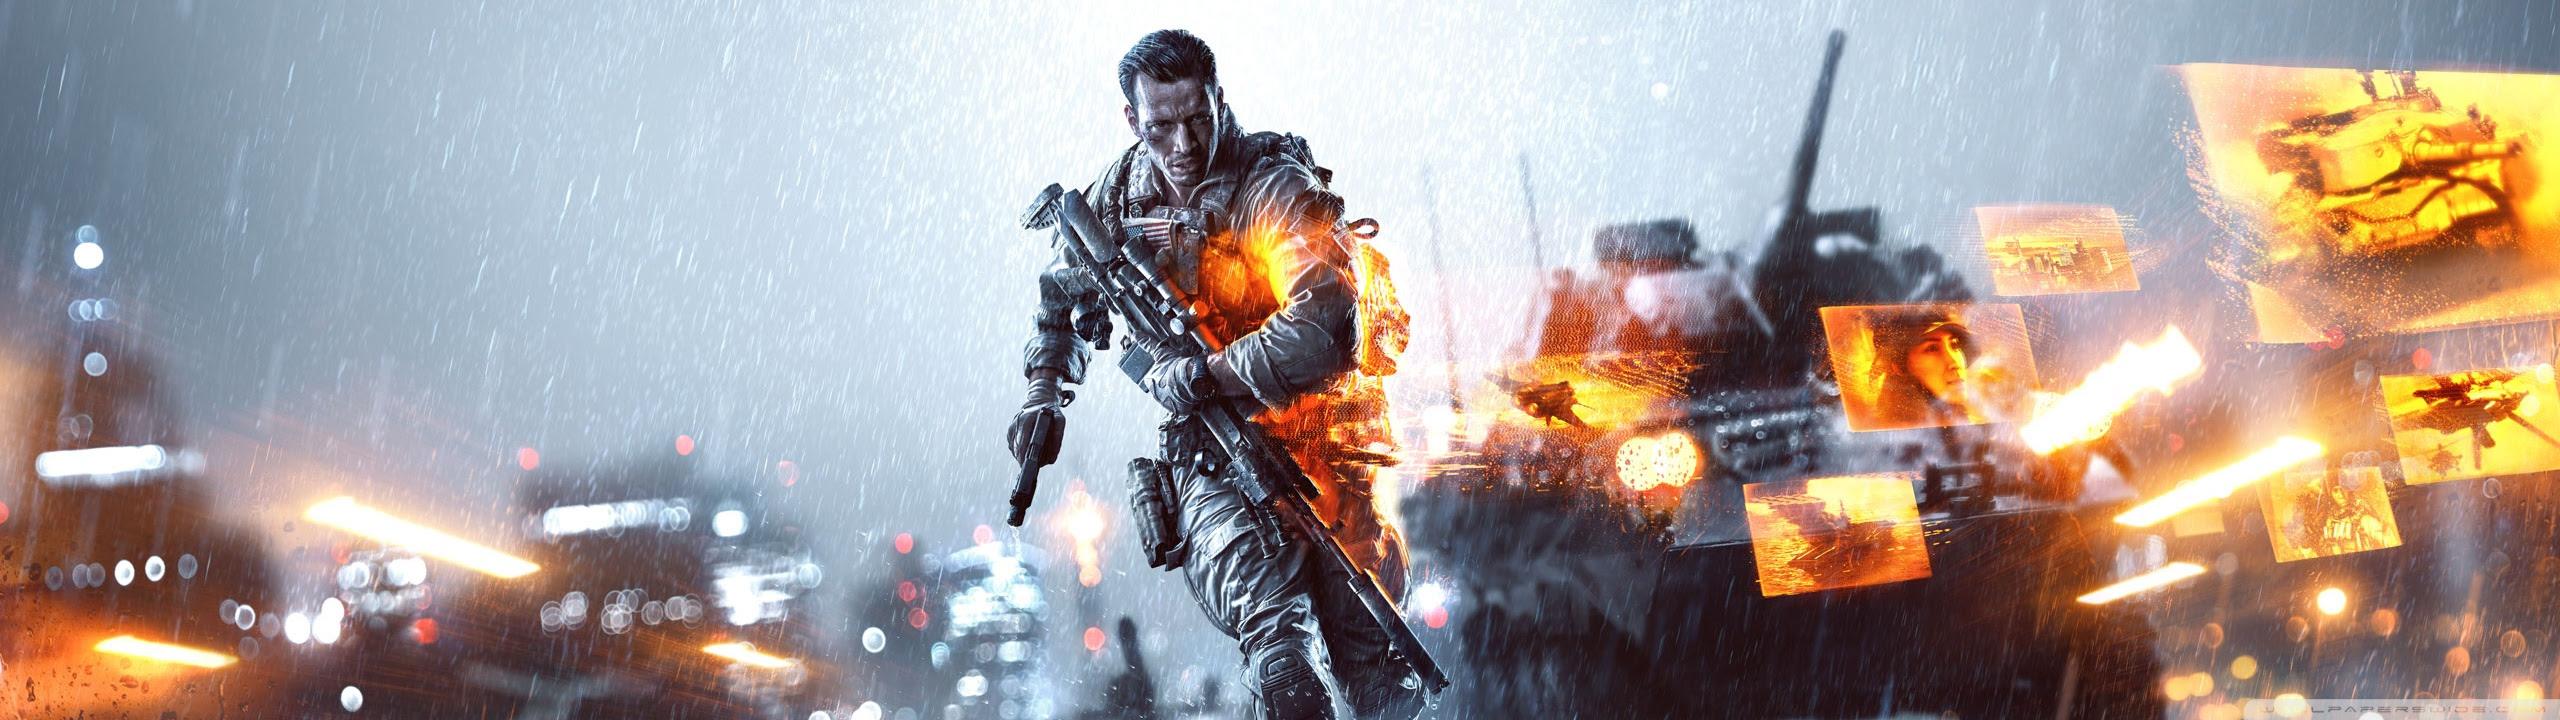 Battlefield 4 Ultra Hd Desktop Background Wallpaper For 4k Uhd Tv